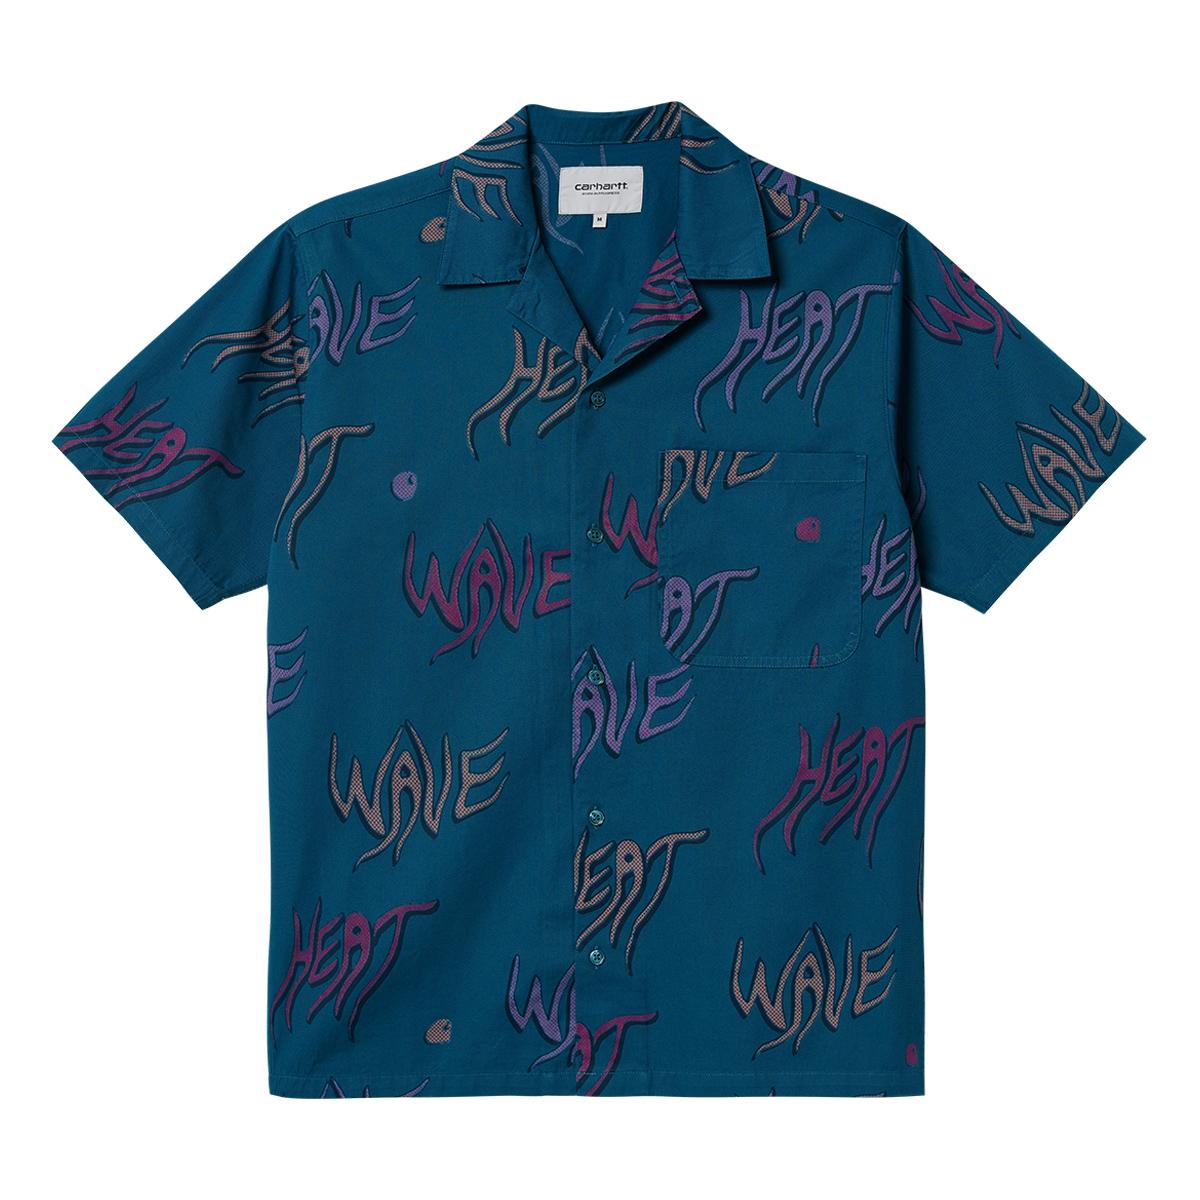 S/S Heat Wave Shirt